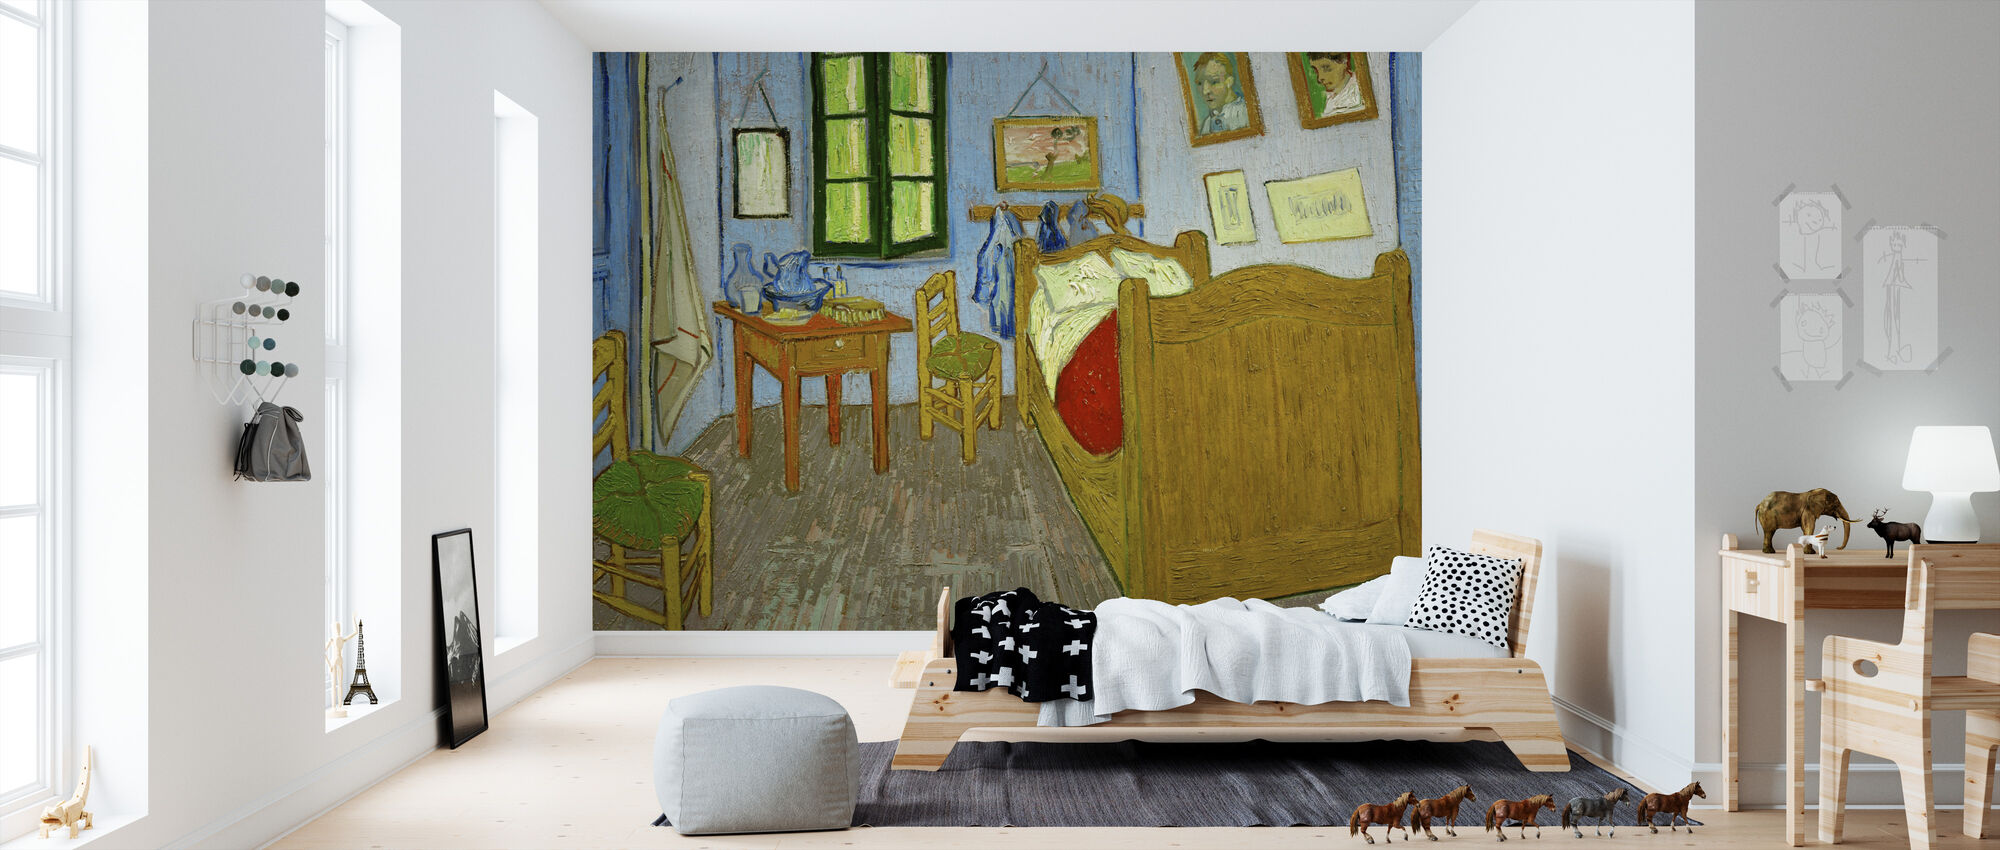 Vincent van Gogh - Arles - Behang - Kinderkamer